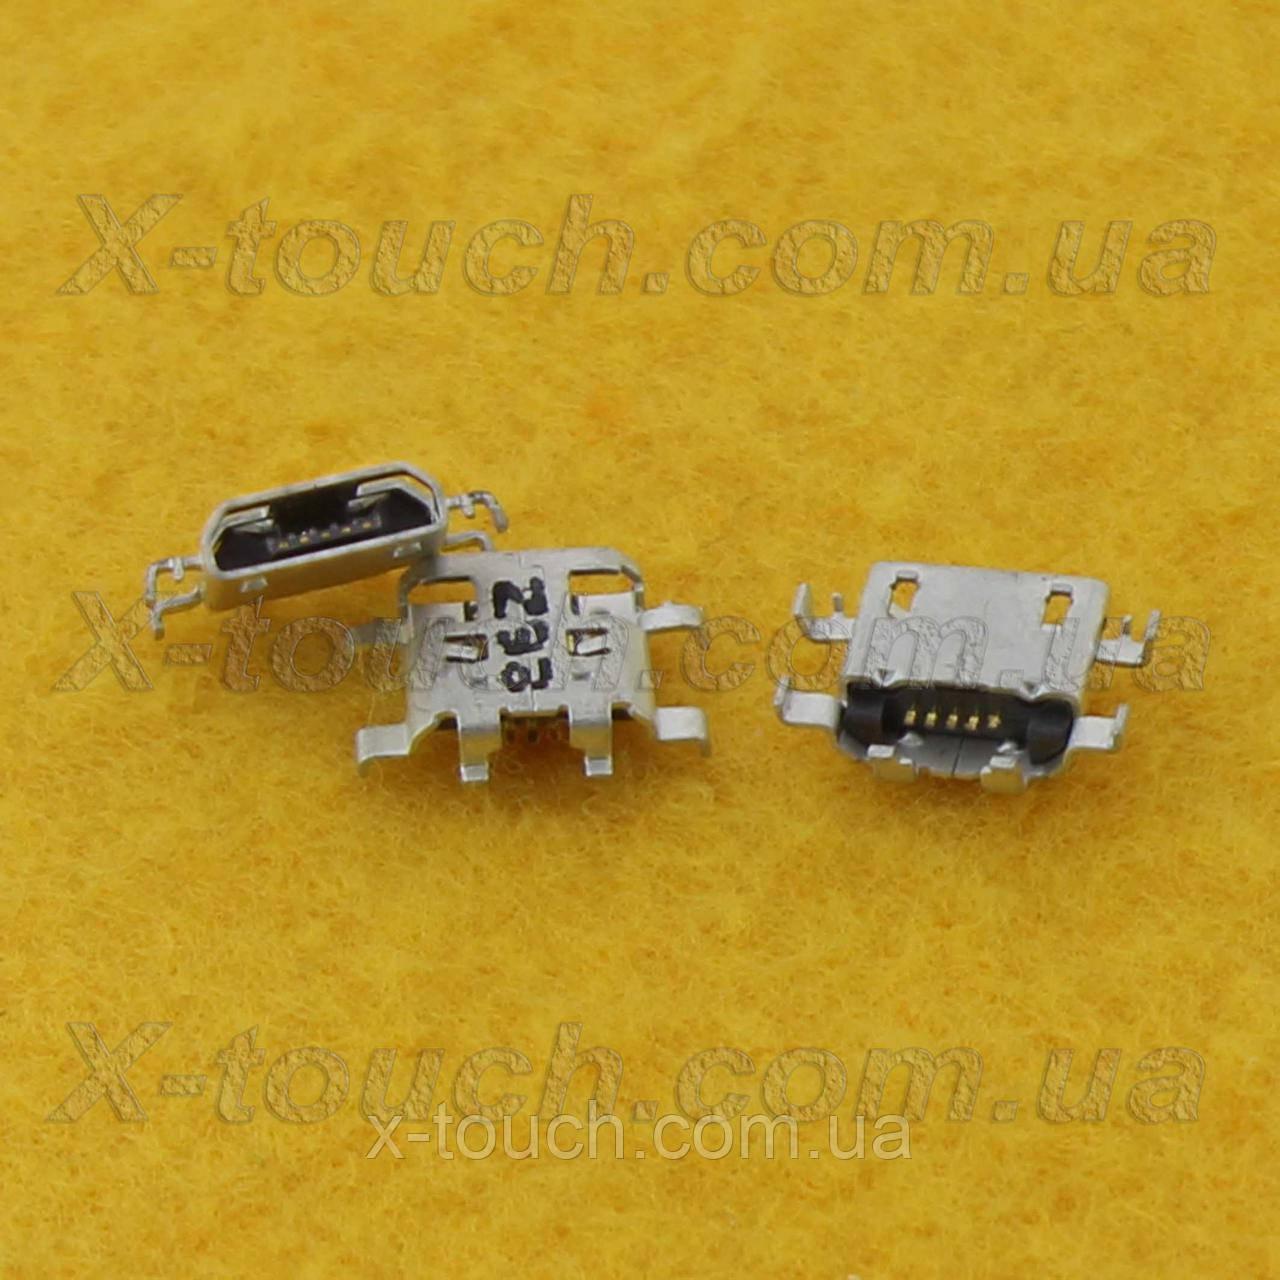 Sony Xperia M2 d2302 разъем зарядки micro-B USB 5pin.